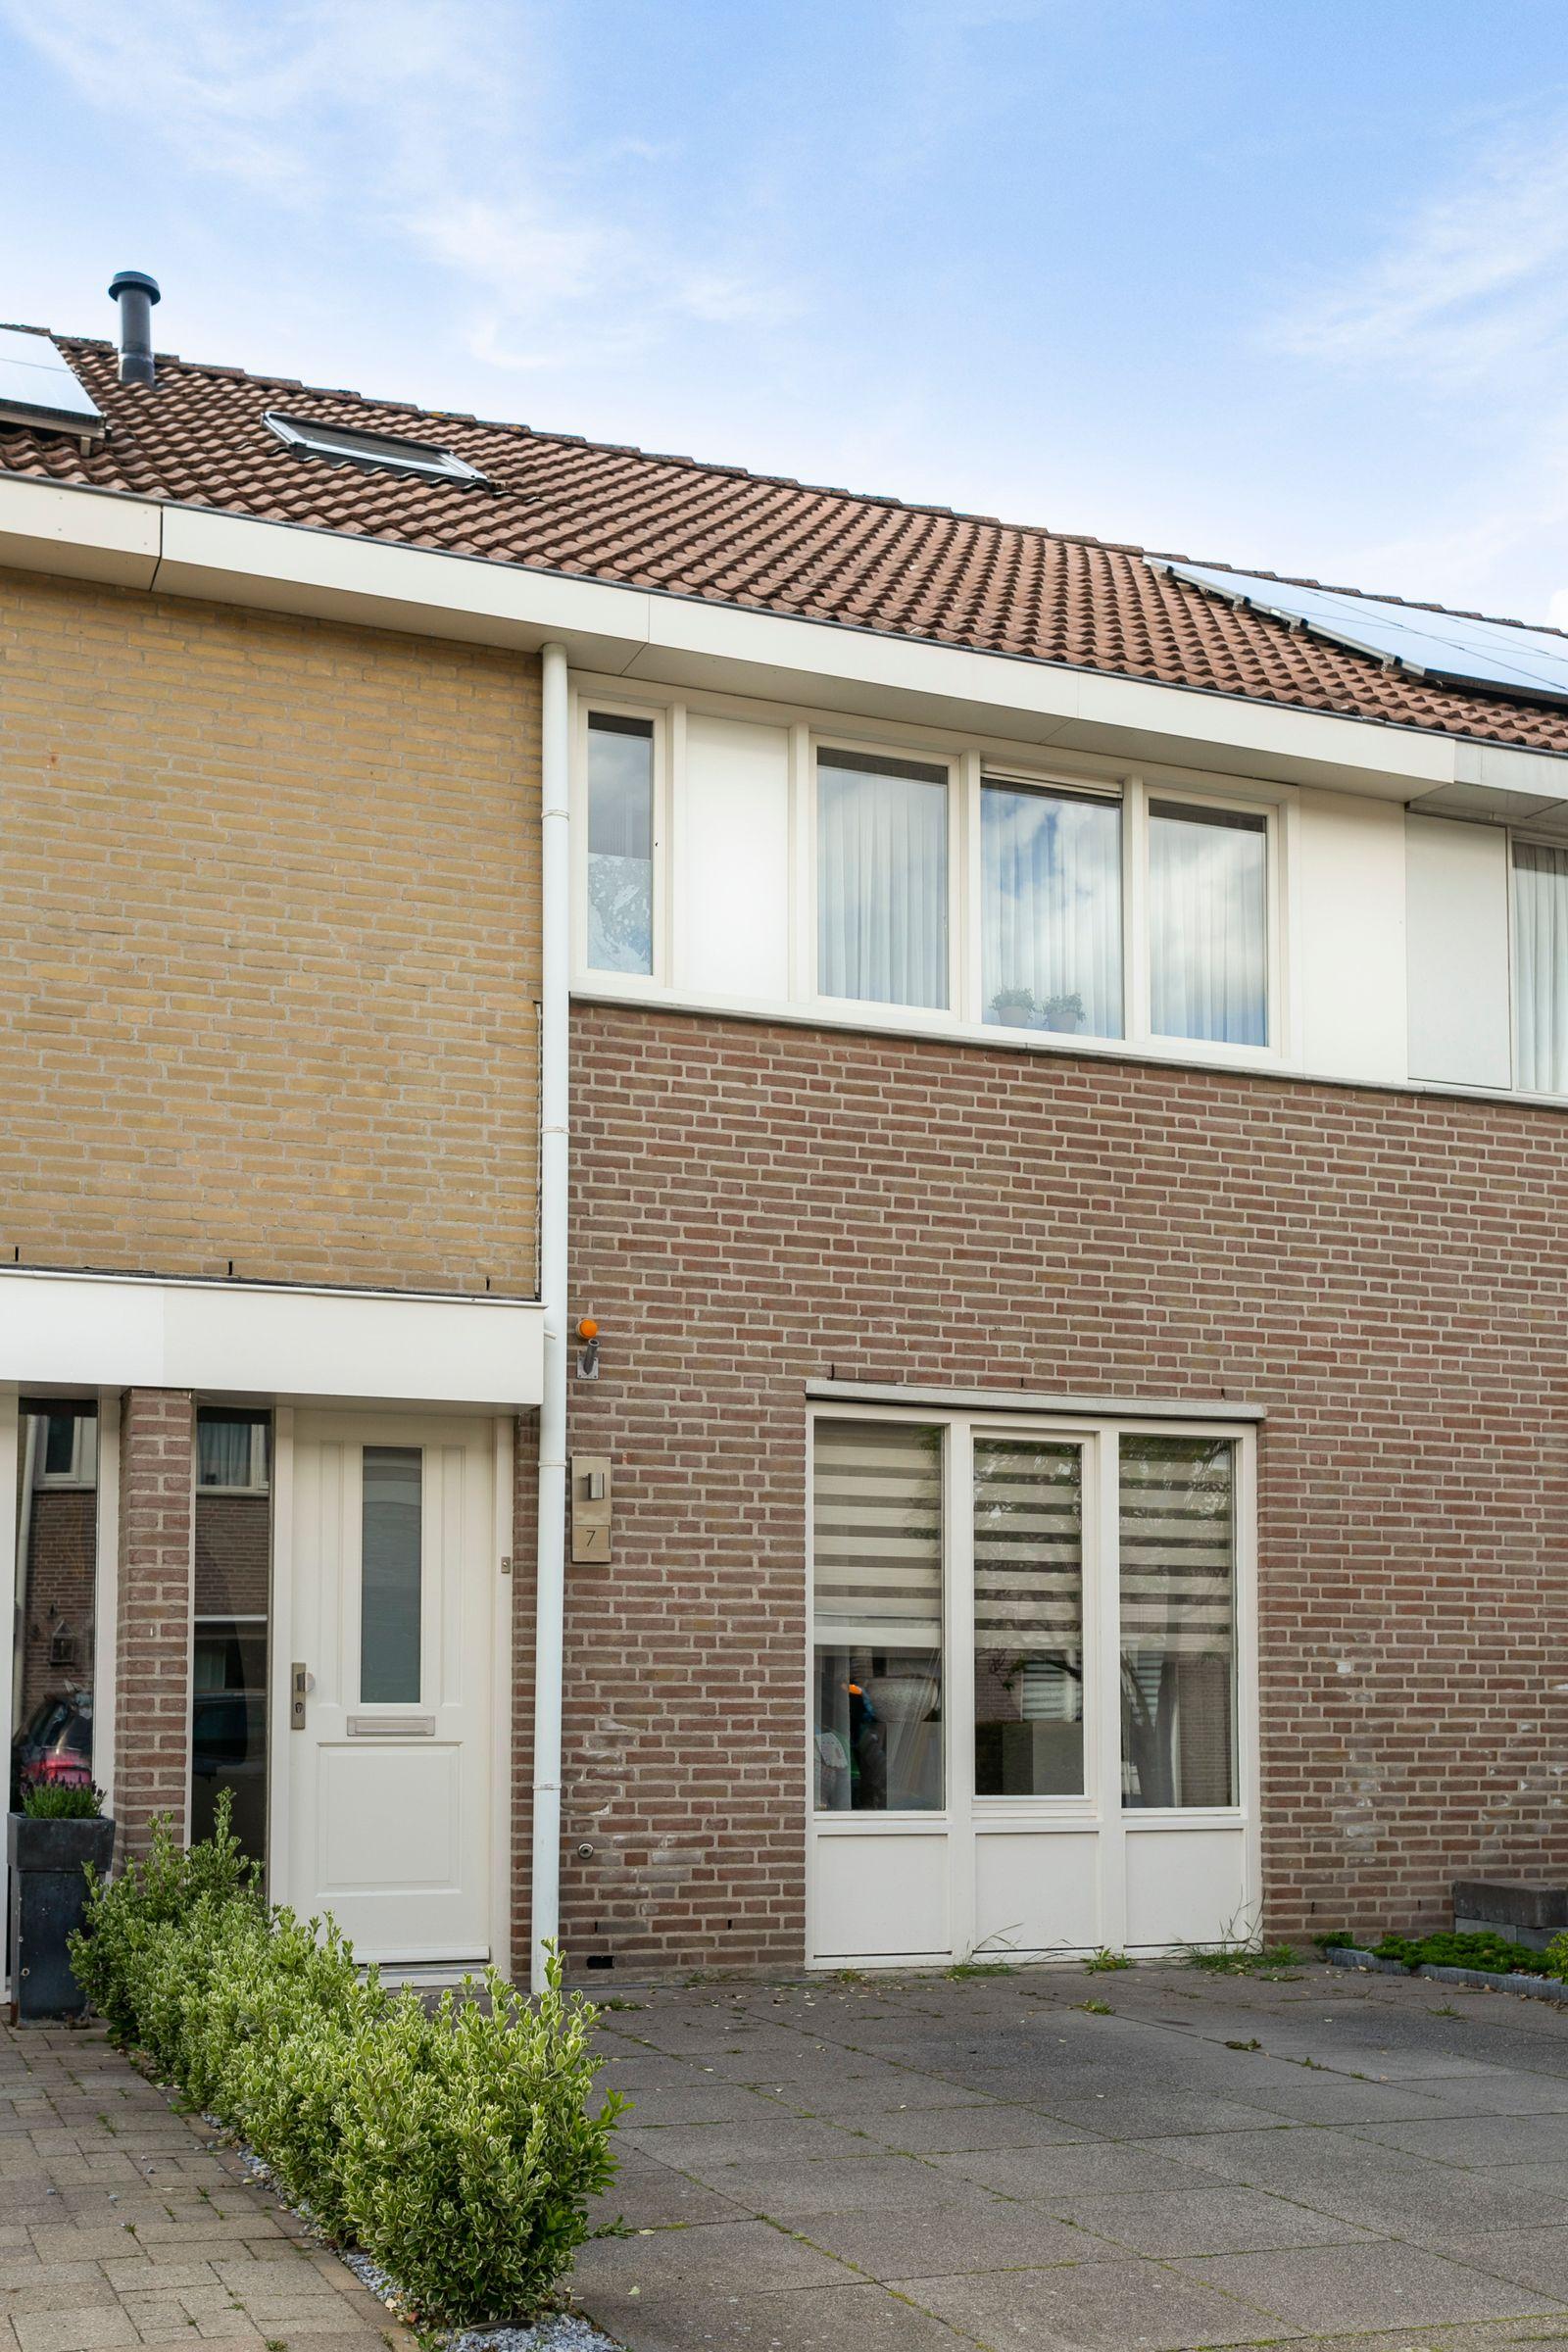 Deldenstraat 7, Tilburg